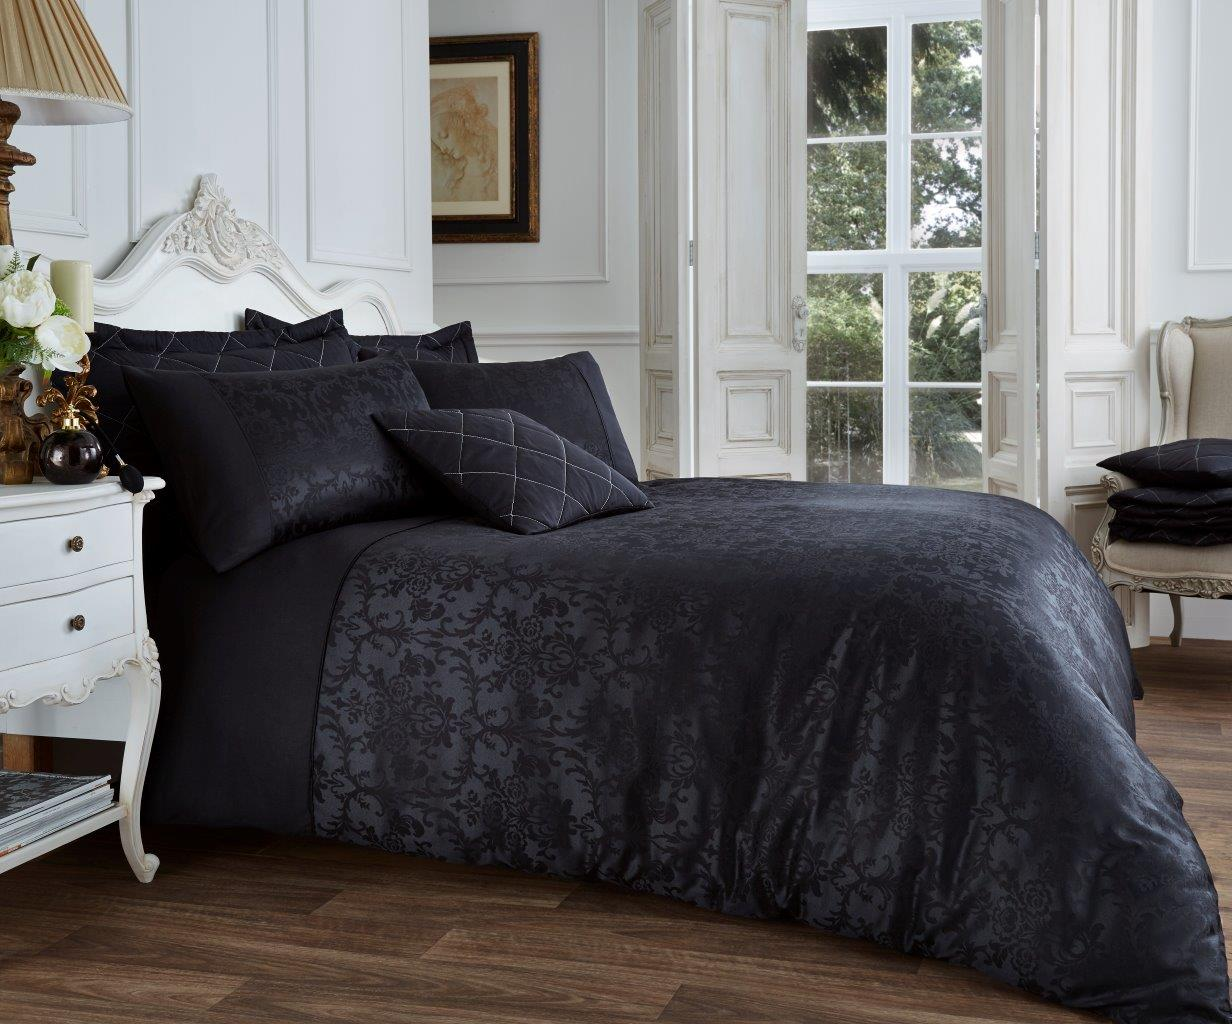 Vincenza Jacquard Luxurious Duvet Cover Set Payndoo Style